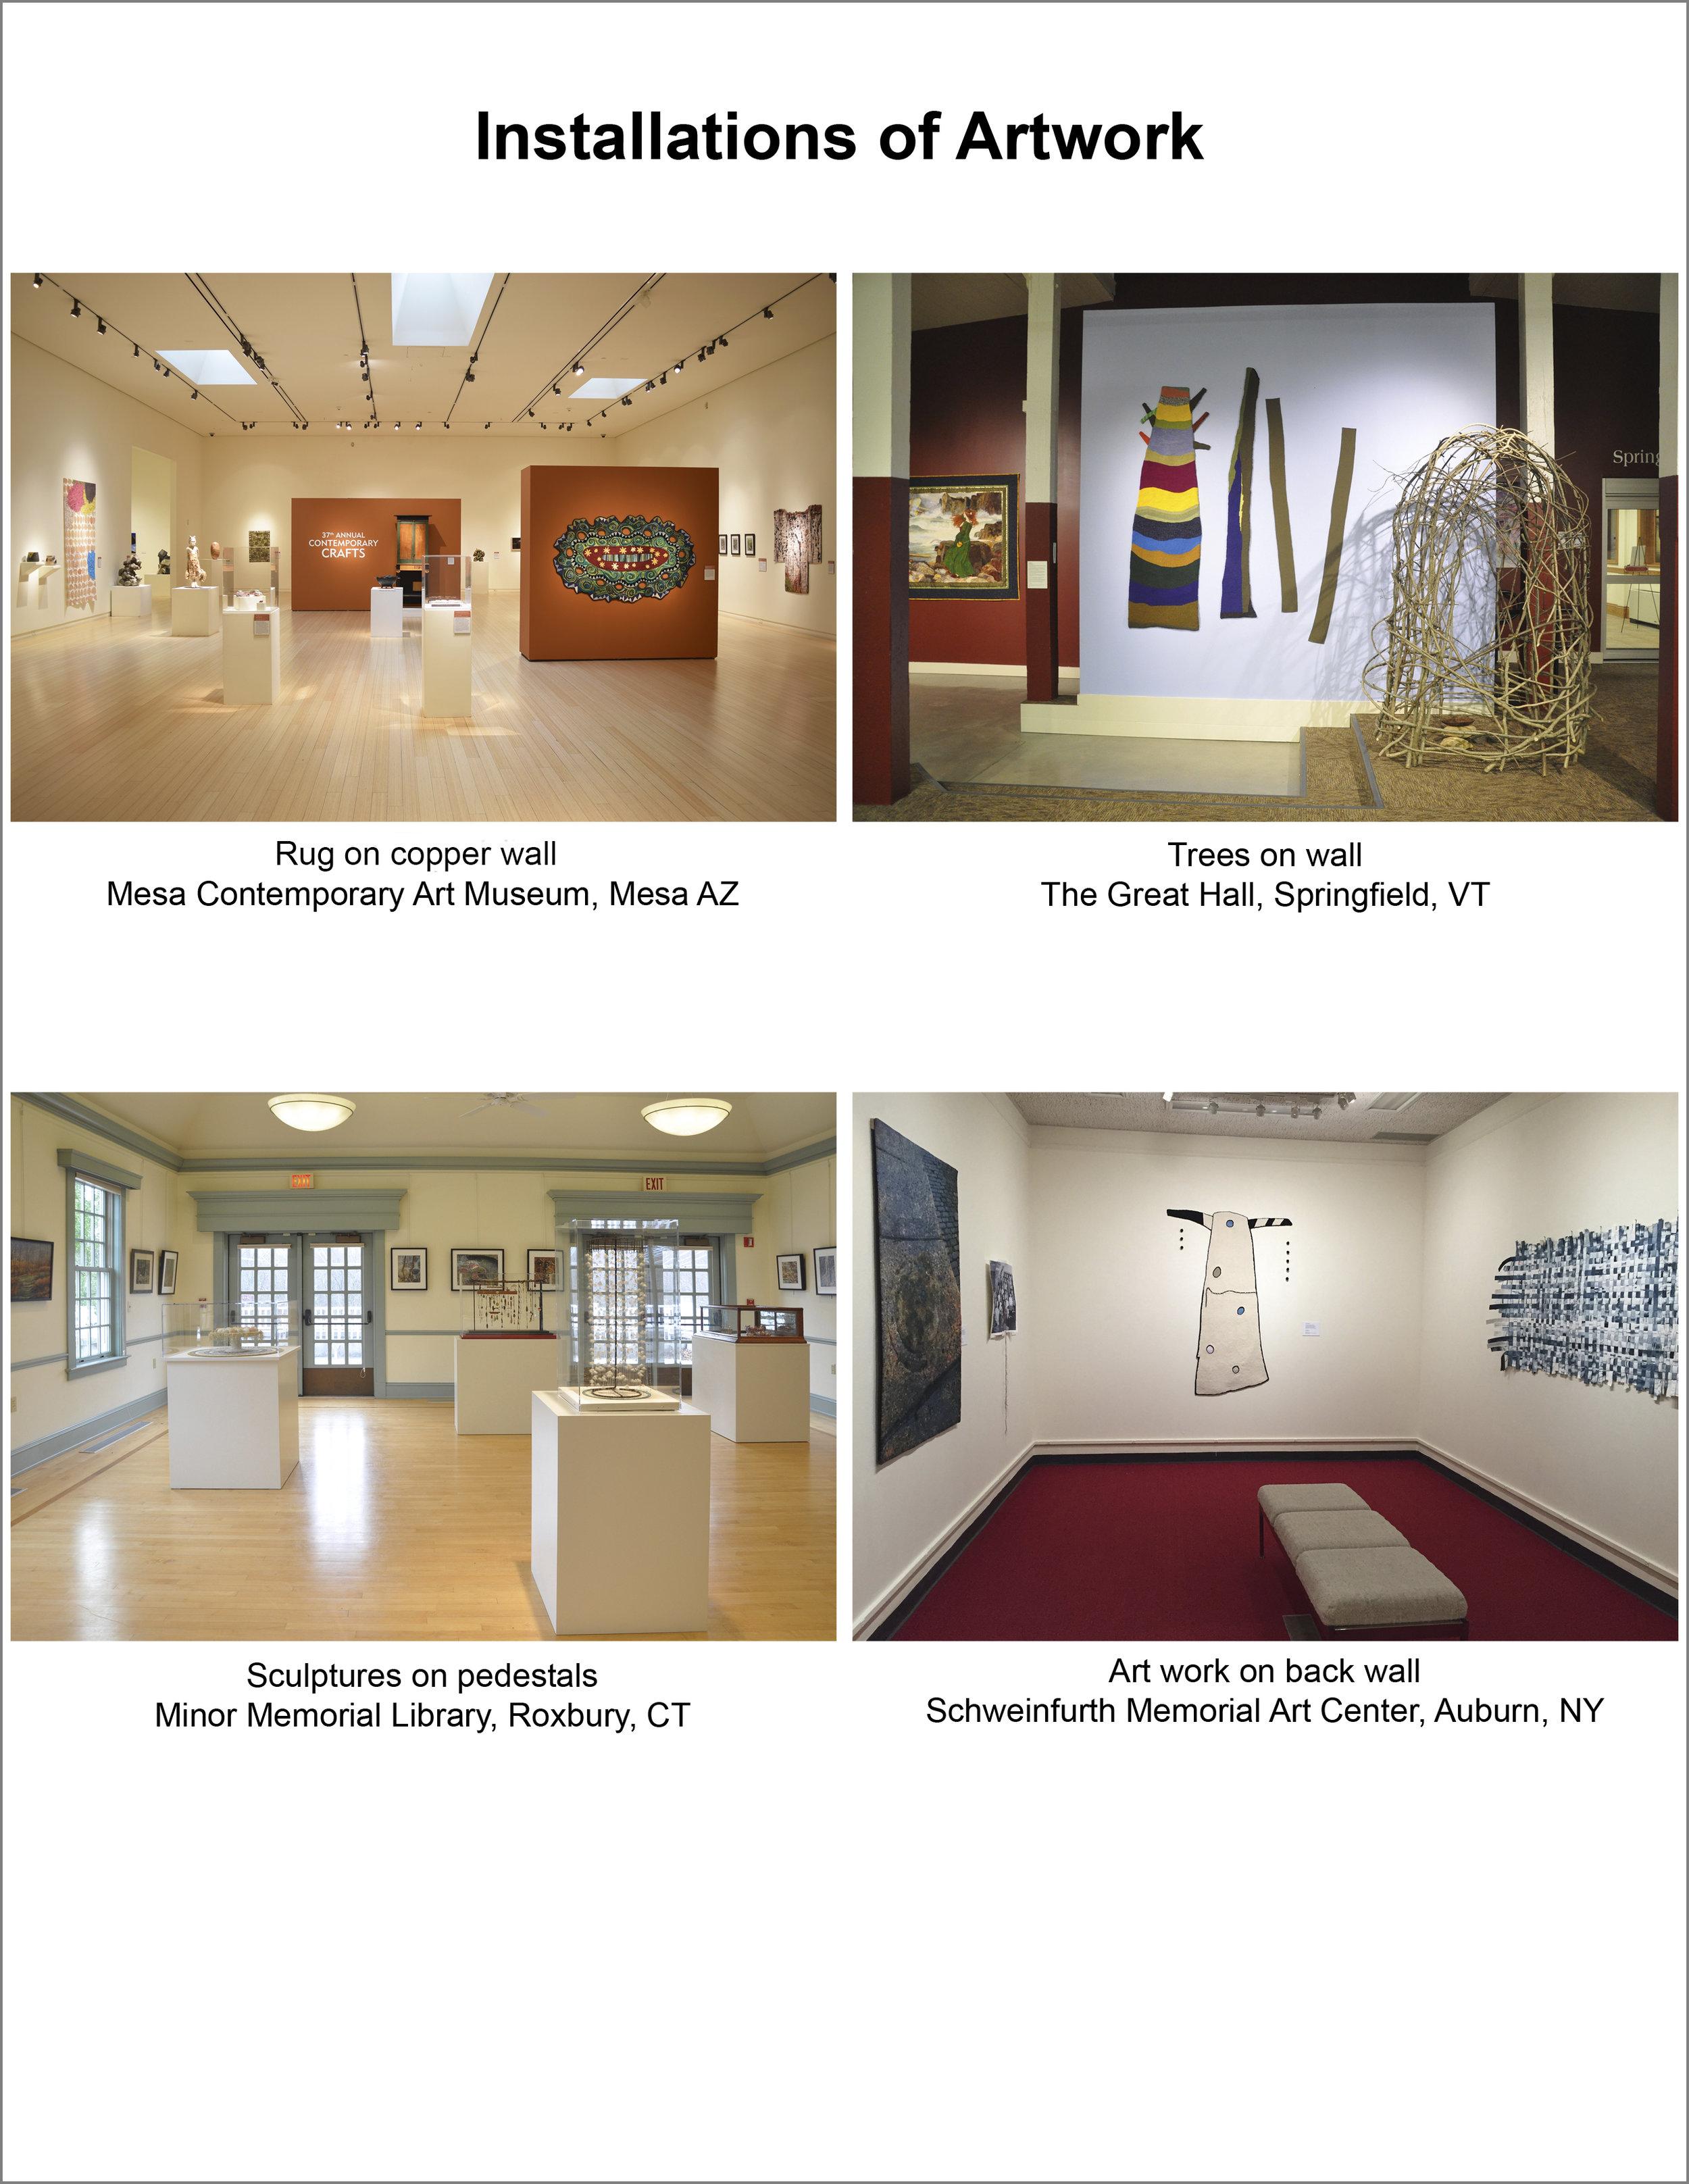 Artwork on Exhibit in Galleries